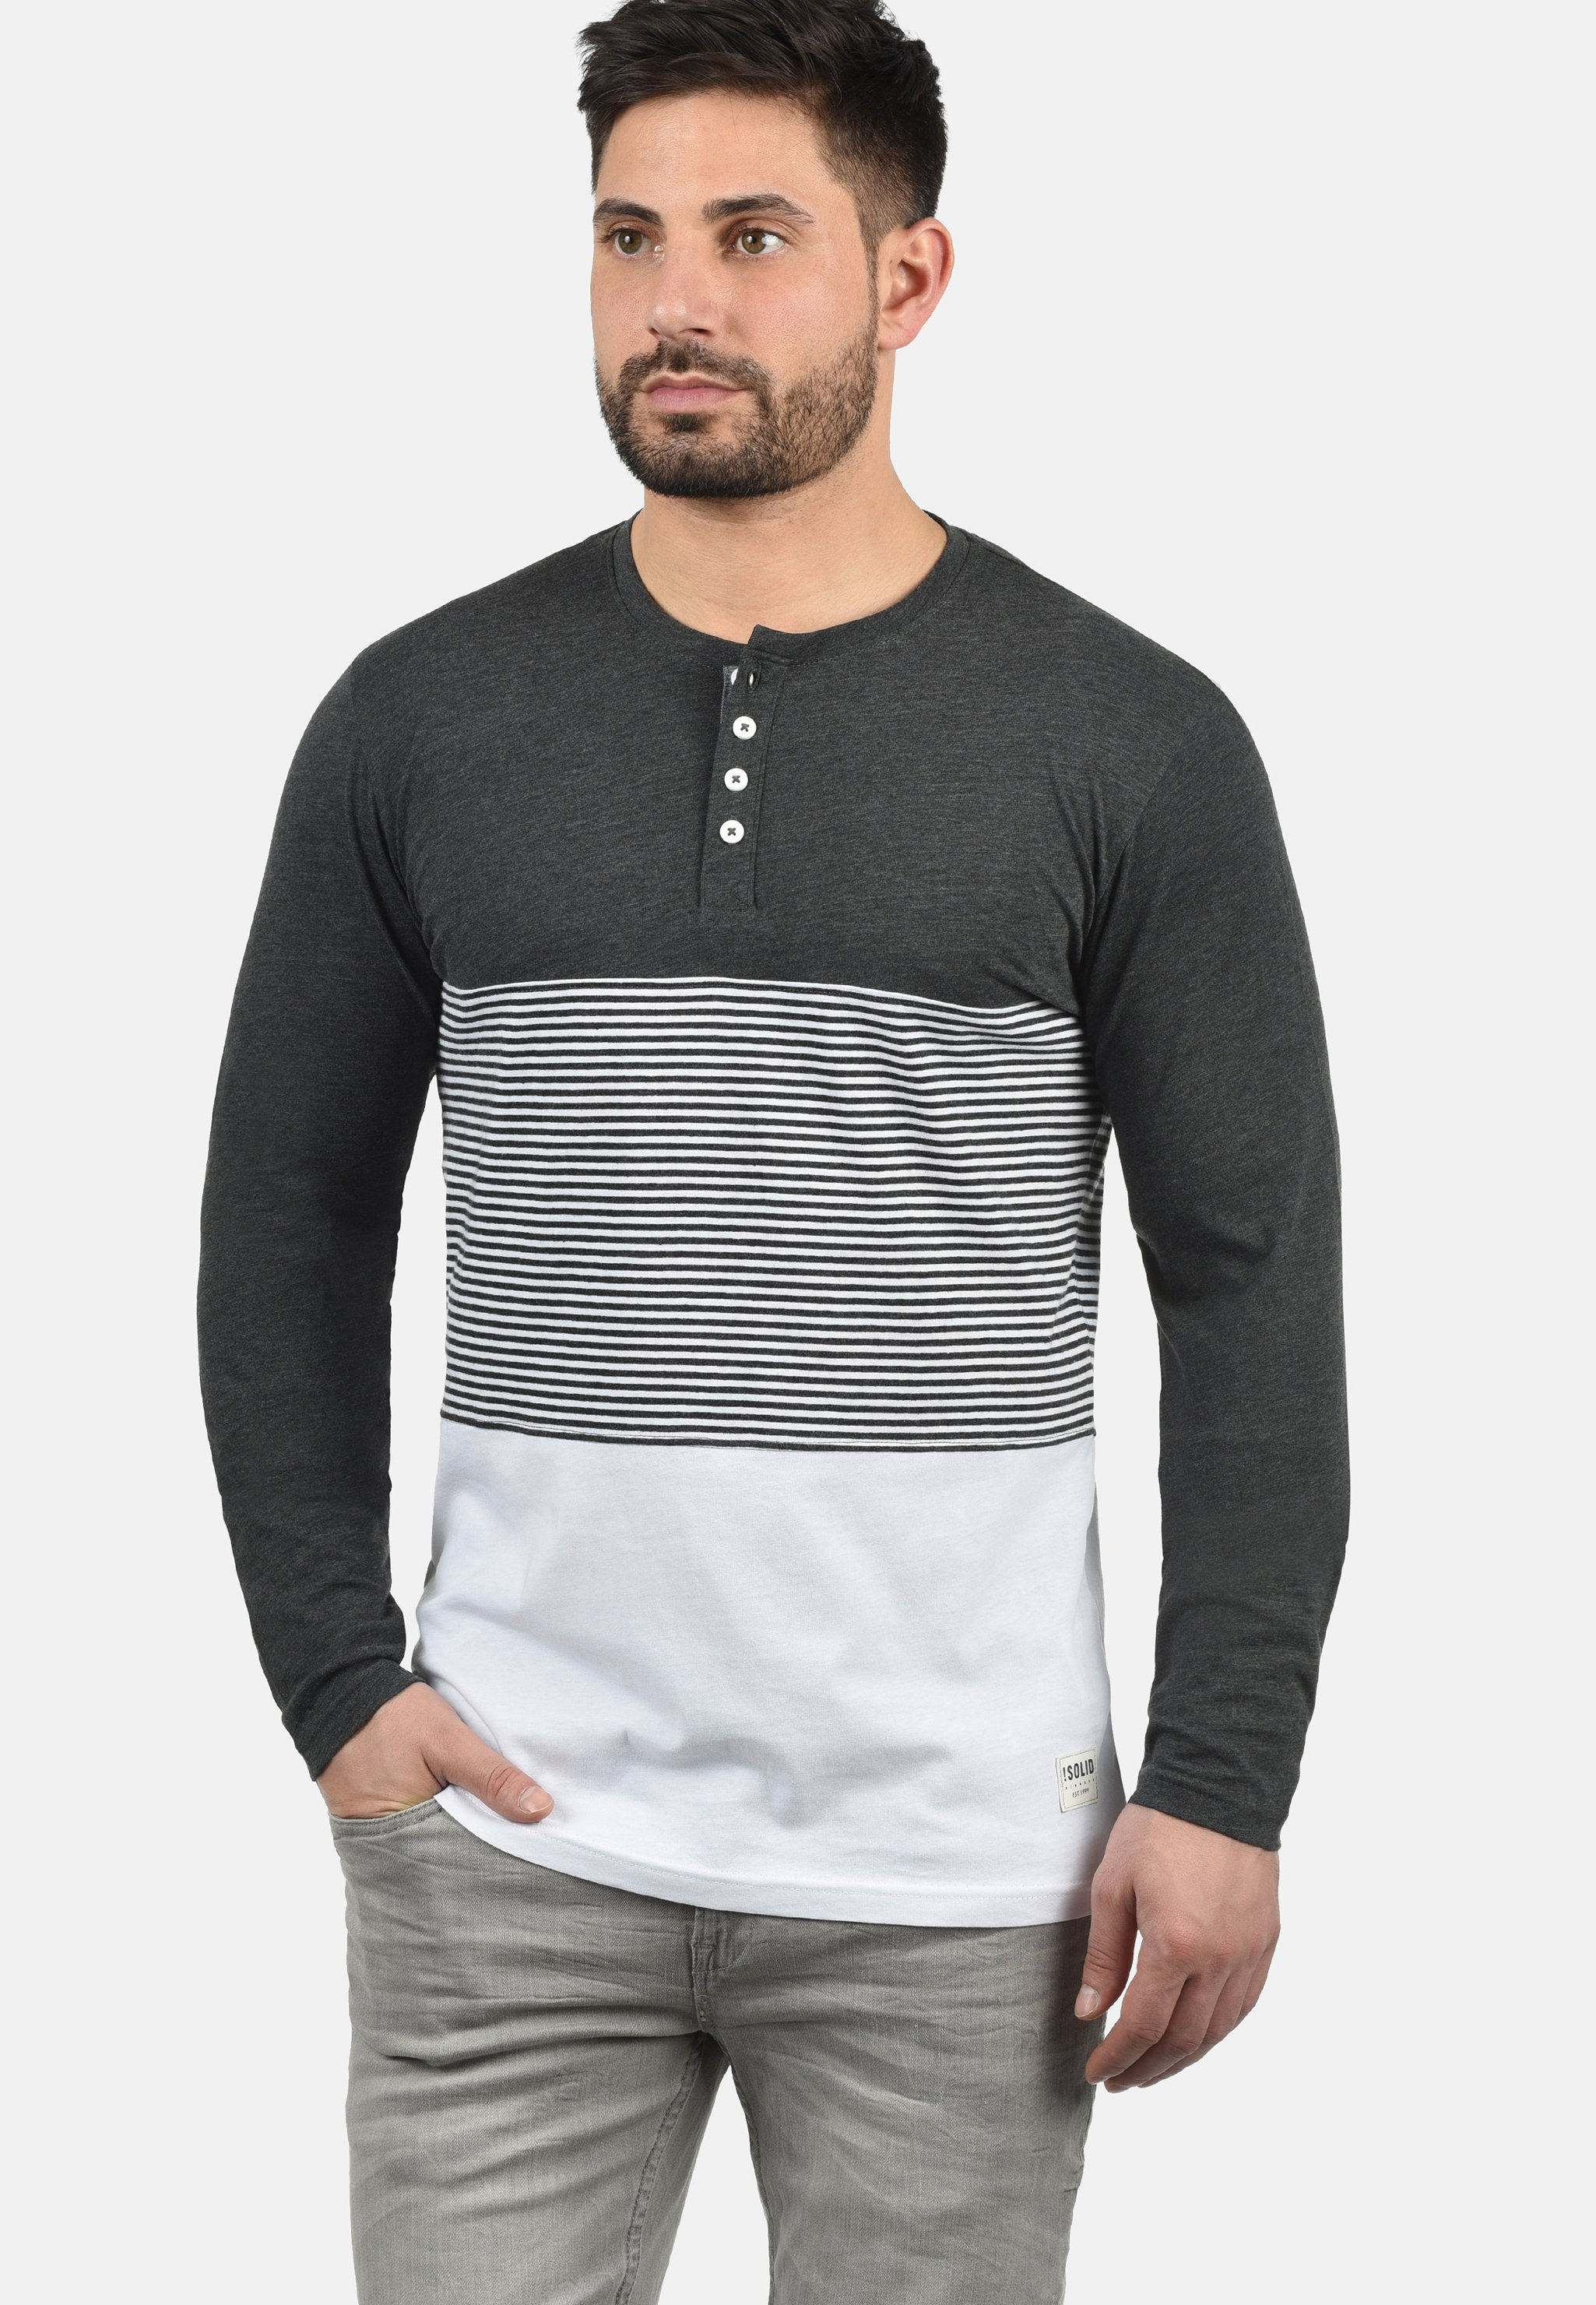 dark dark dark Solid Solid grey MARTELangarmshirt grey Solid Solid grey MARTELangarmshirt MARTELangarmshirt vNnwmO80